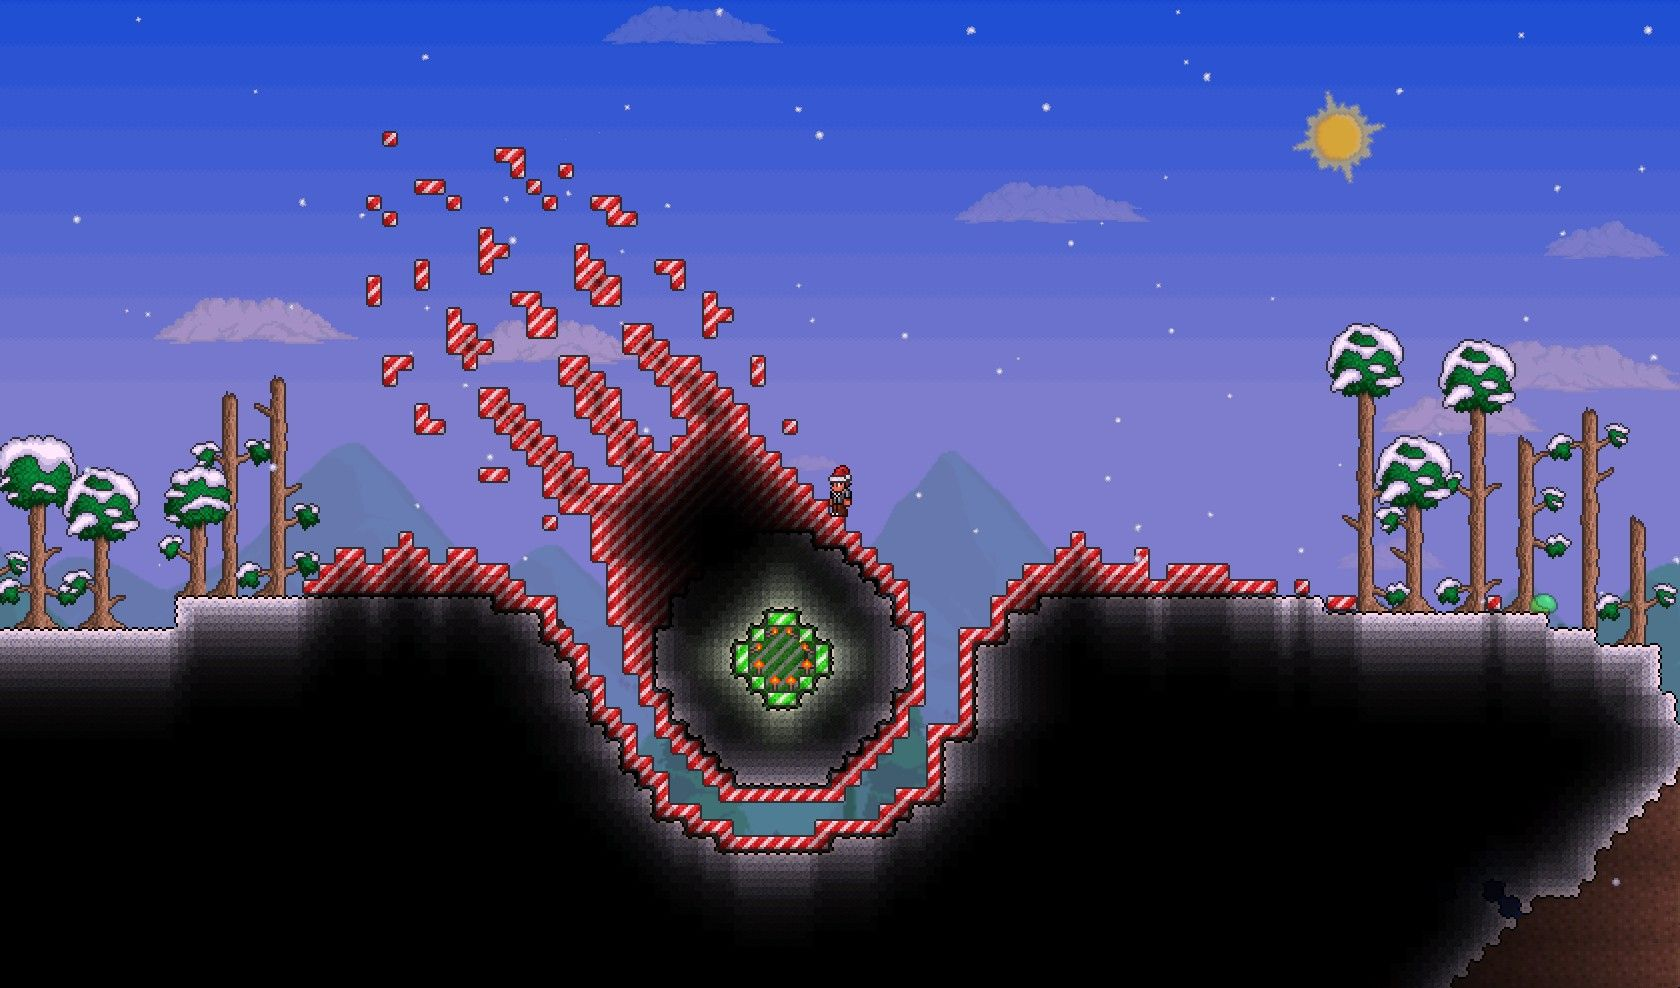 Terraria Online Play For Free At Playminecraftinfo Juegos De - Minecraft terraria spielen